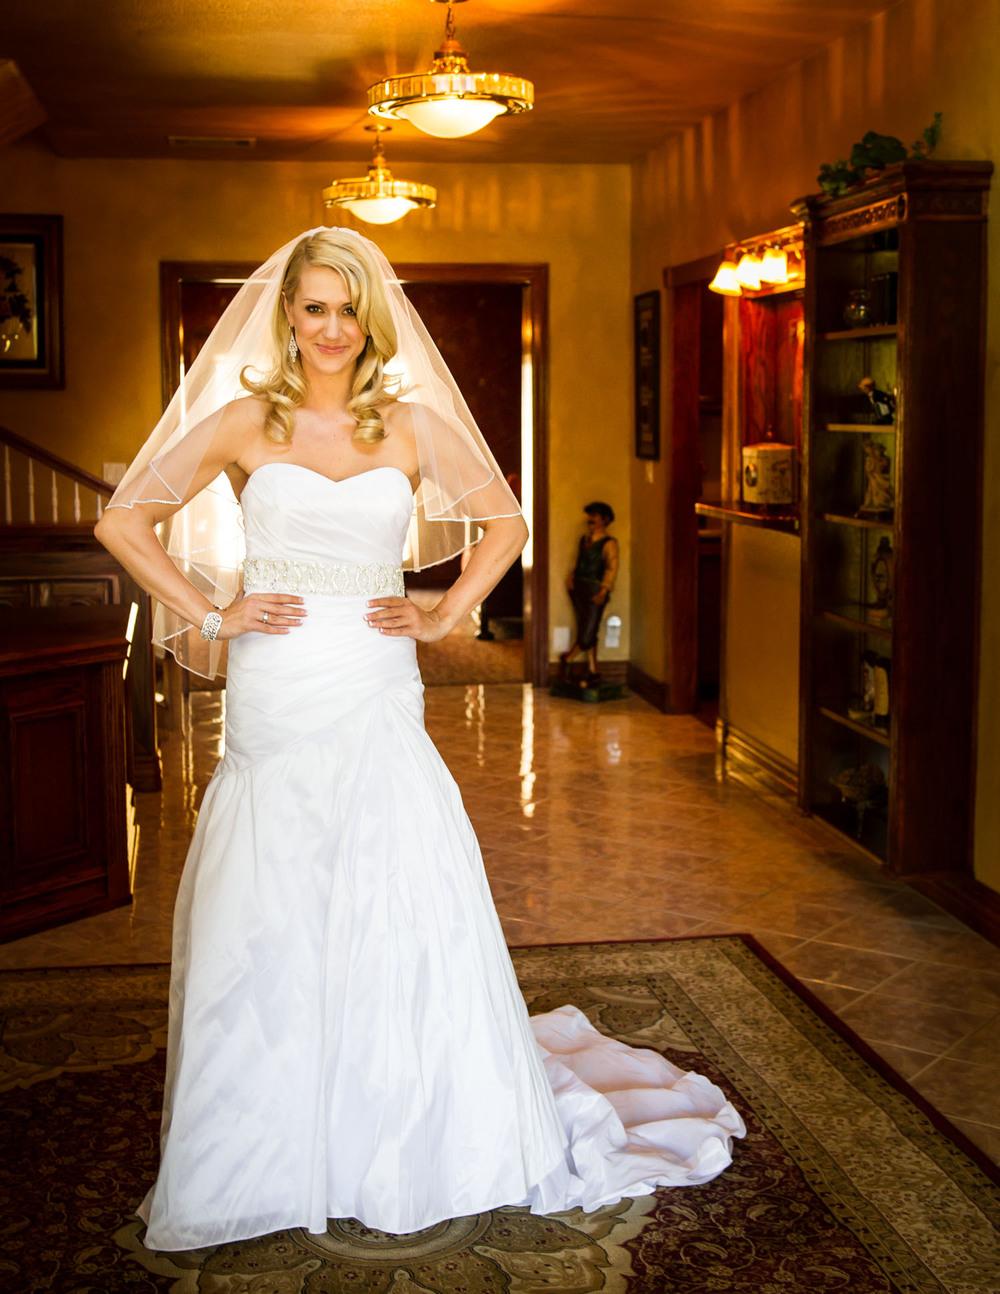 stewart_bertrand_wedding_photography_fclblogwed-1003.jpg